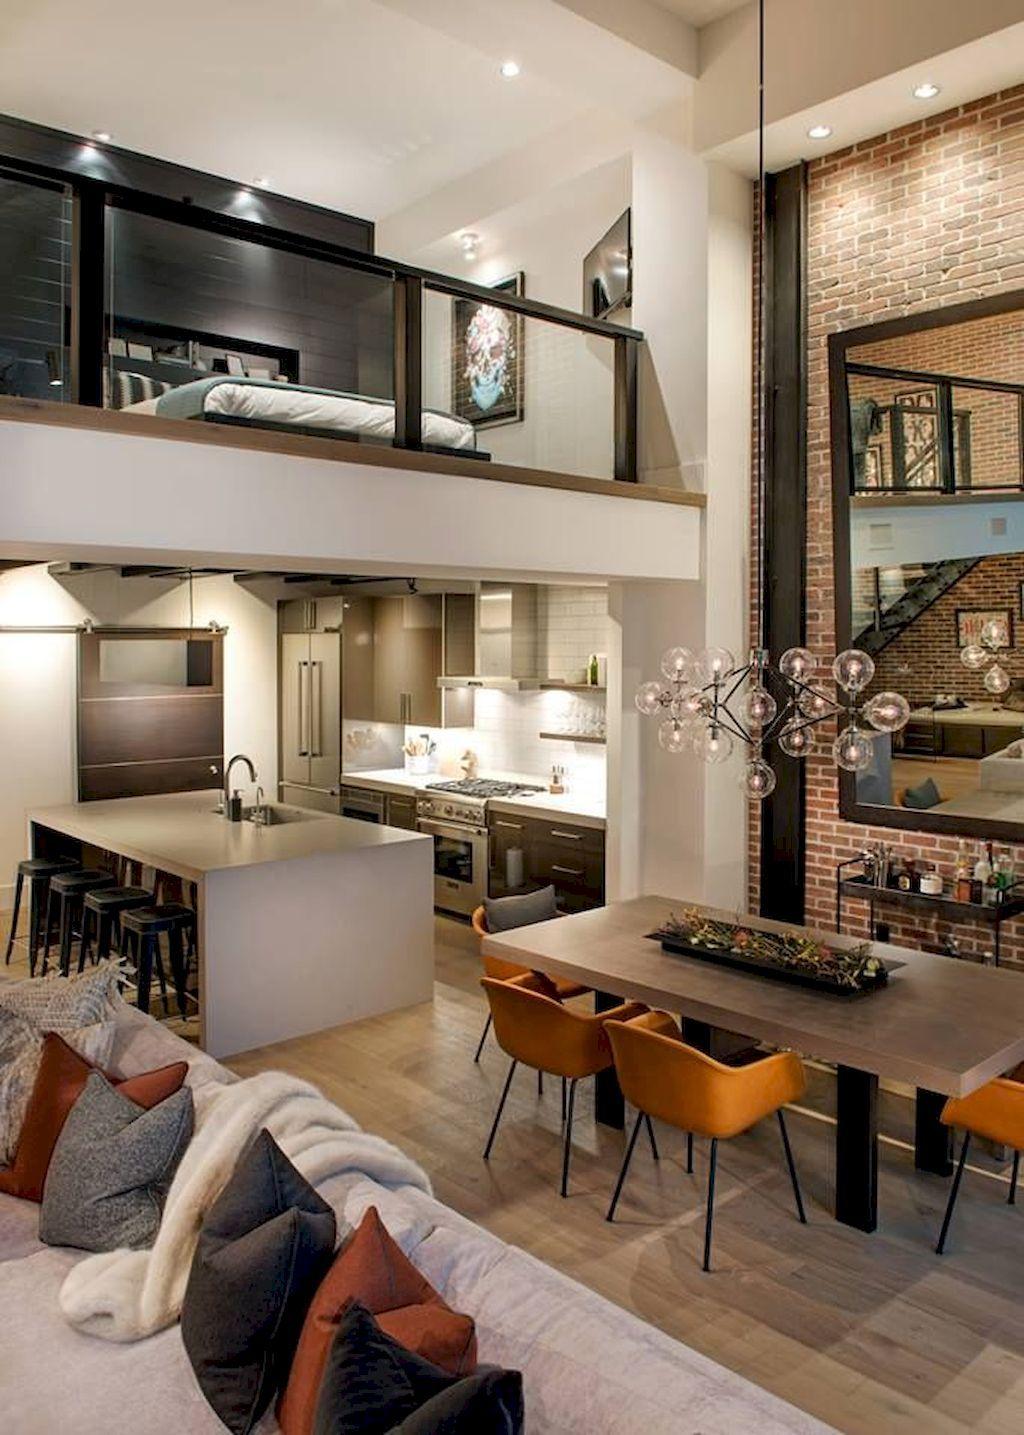 Design hotel loft house small interior duplex salon also ideas living room books rh pinterest